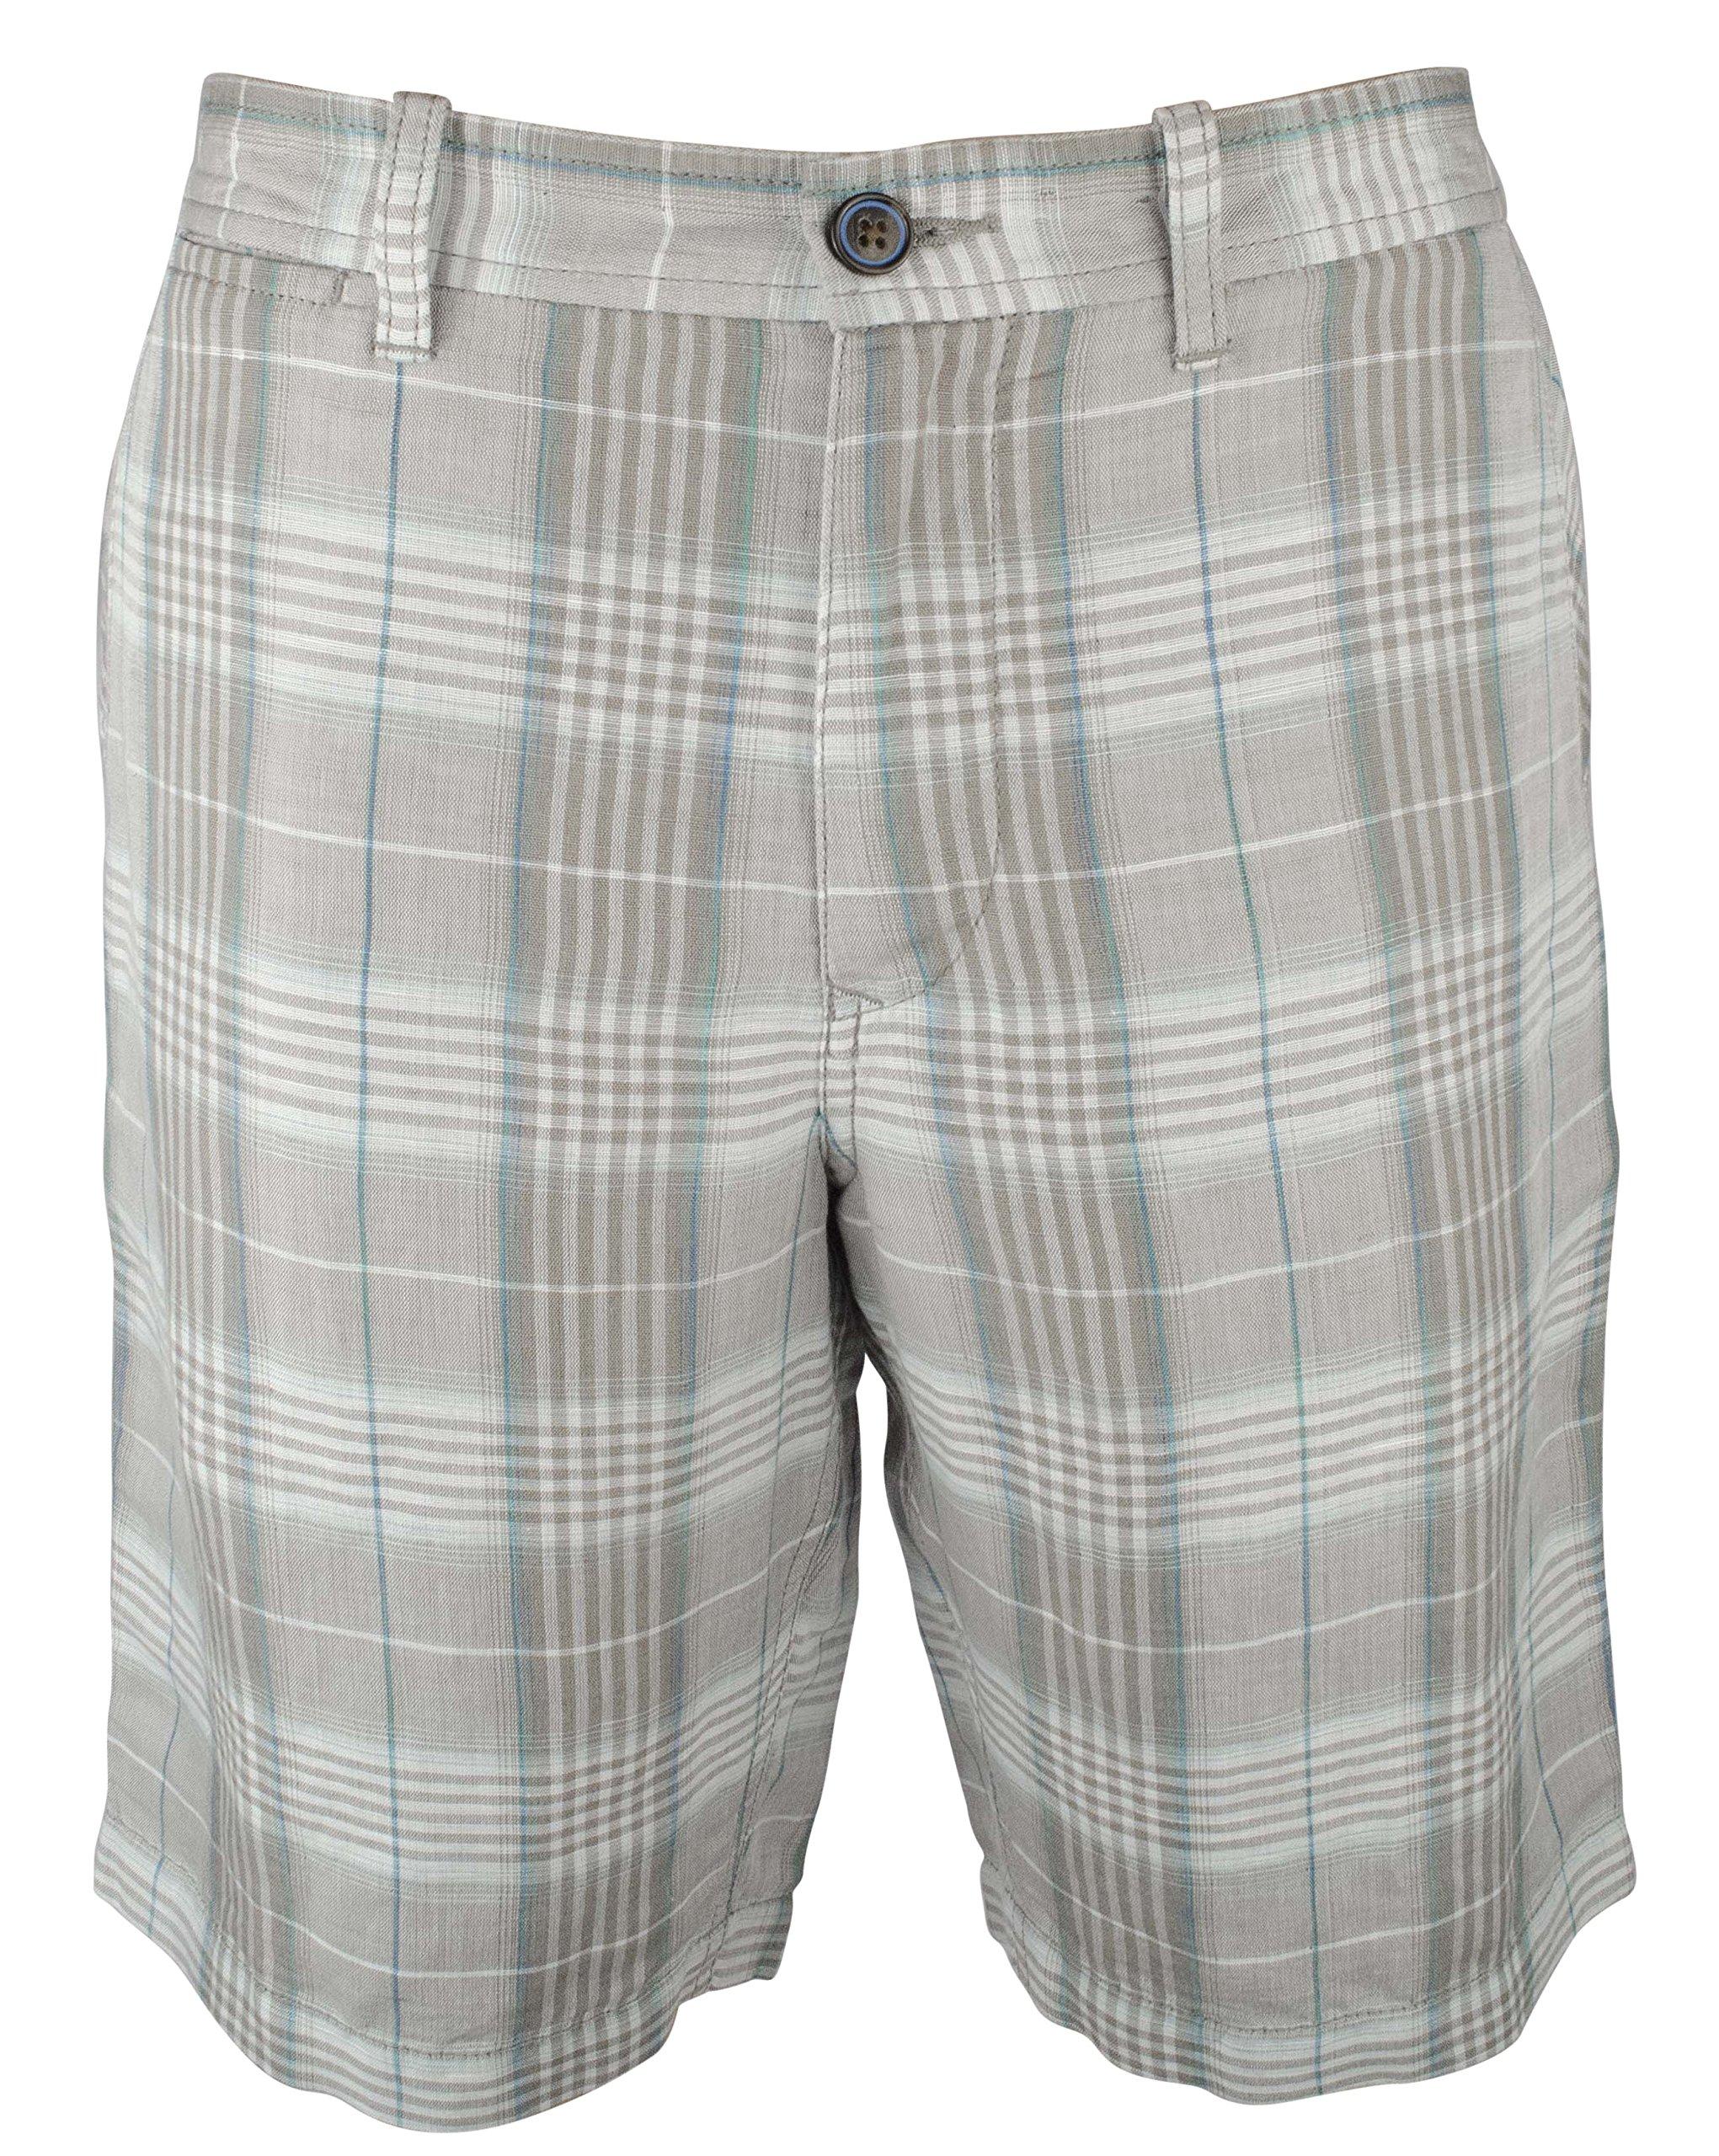 Tommy Bahama Men's Caldera Plaid Shorts-DT-32